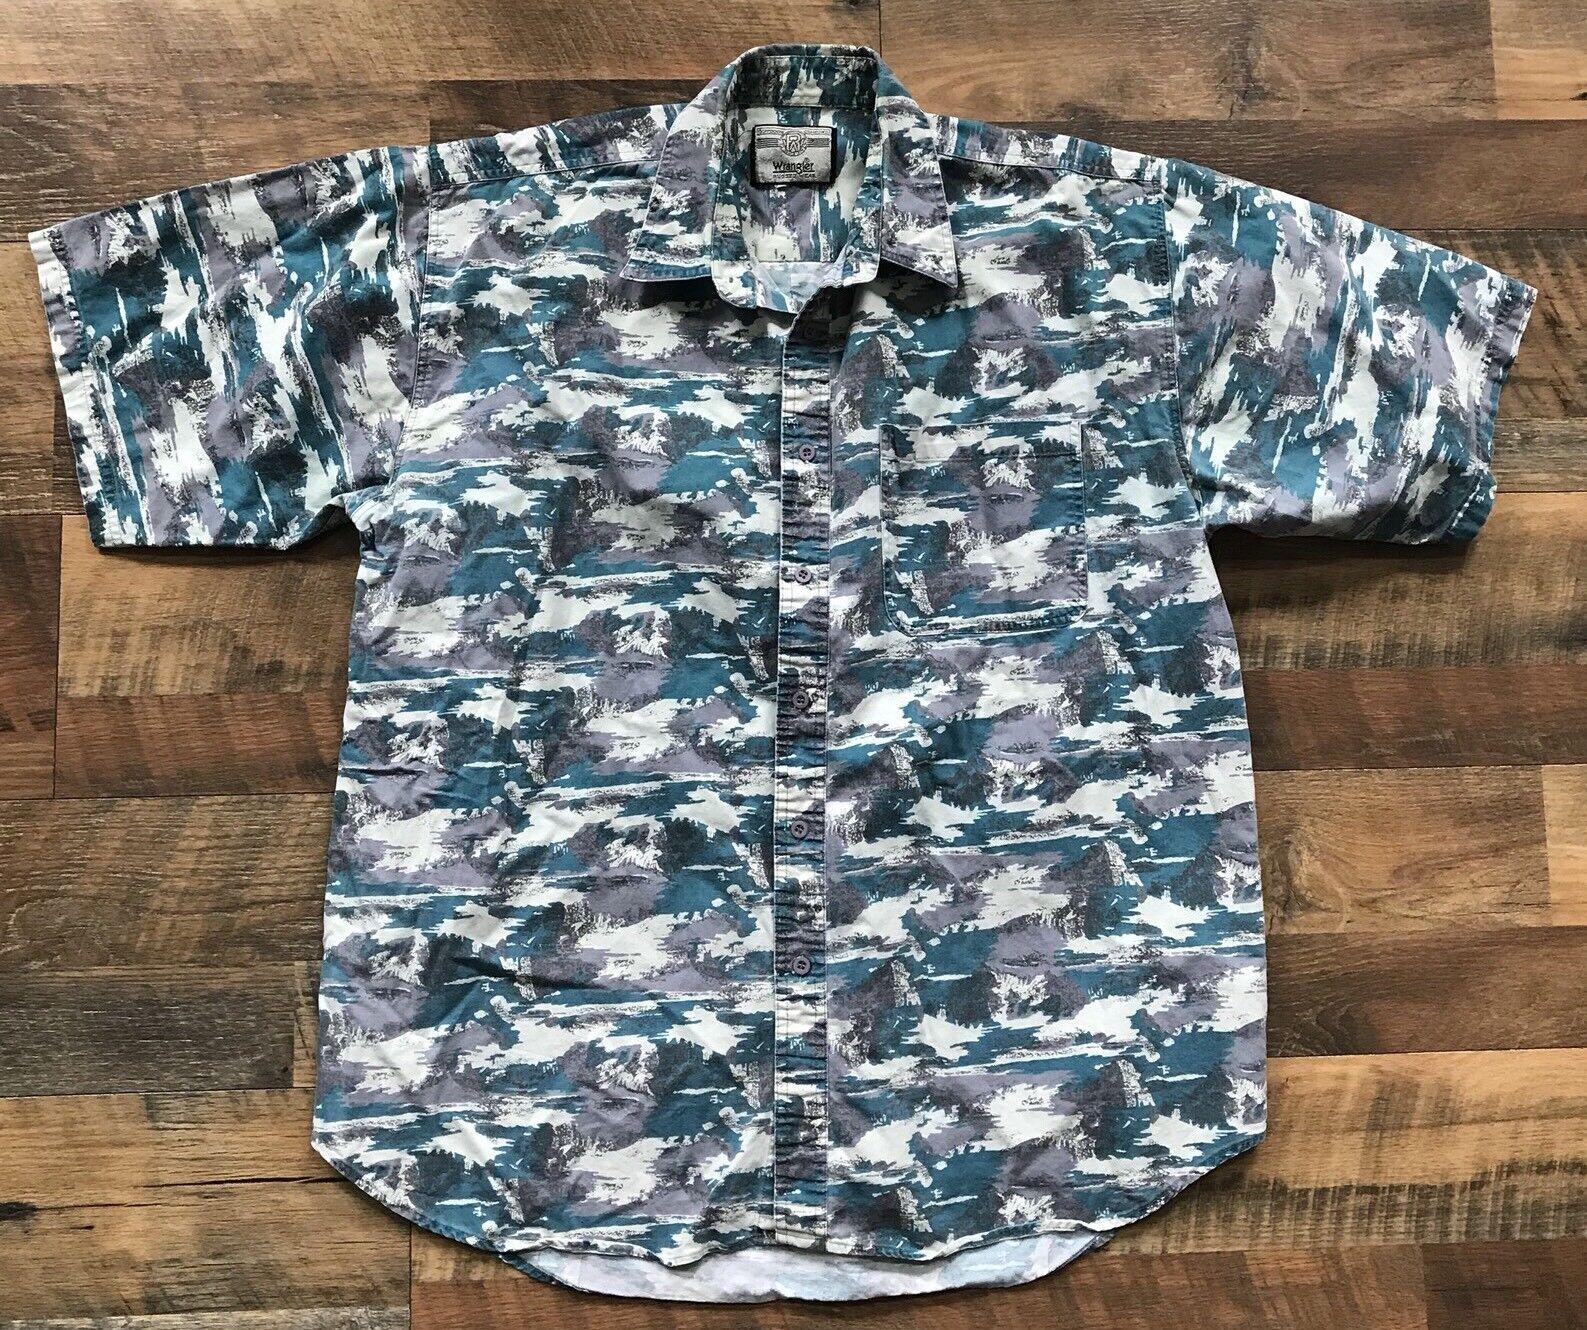 732b566ed3 VTG Wrangler Shirt Western Cowboy Rodeo Rancher Mountains Abstract Men XL  owfldo4029-Casual Shirts   Tops